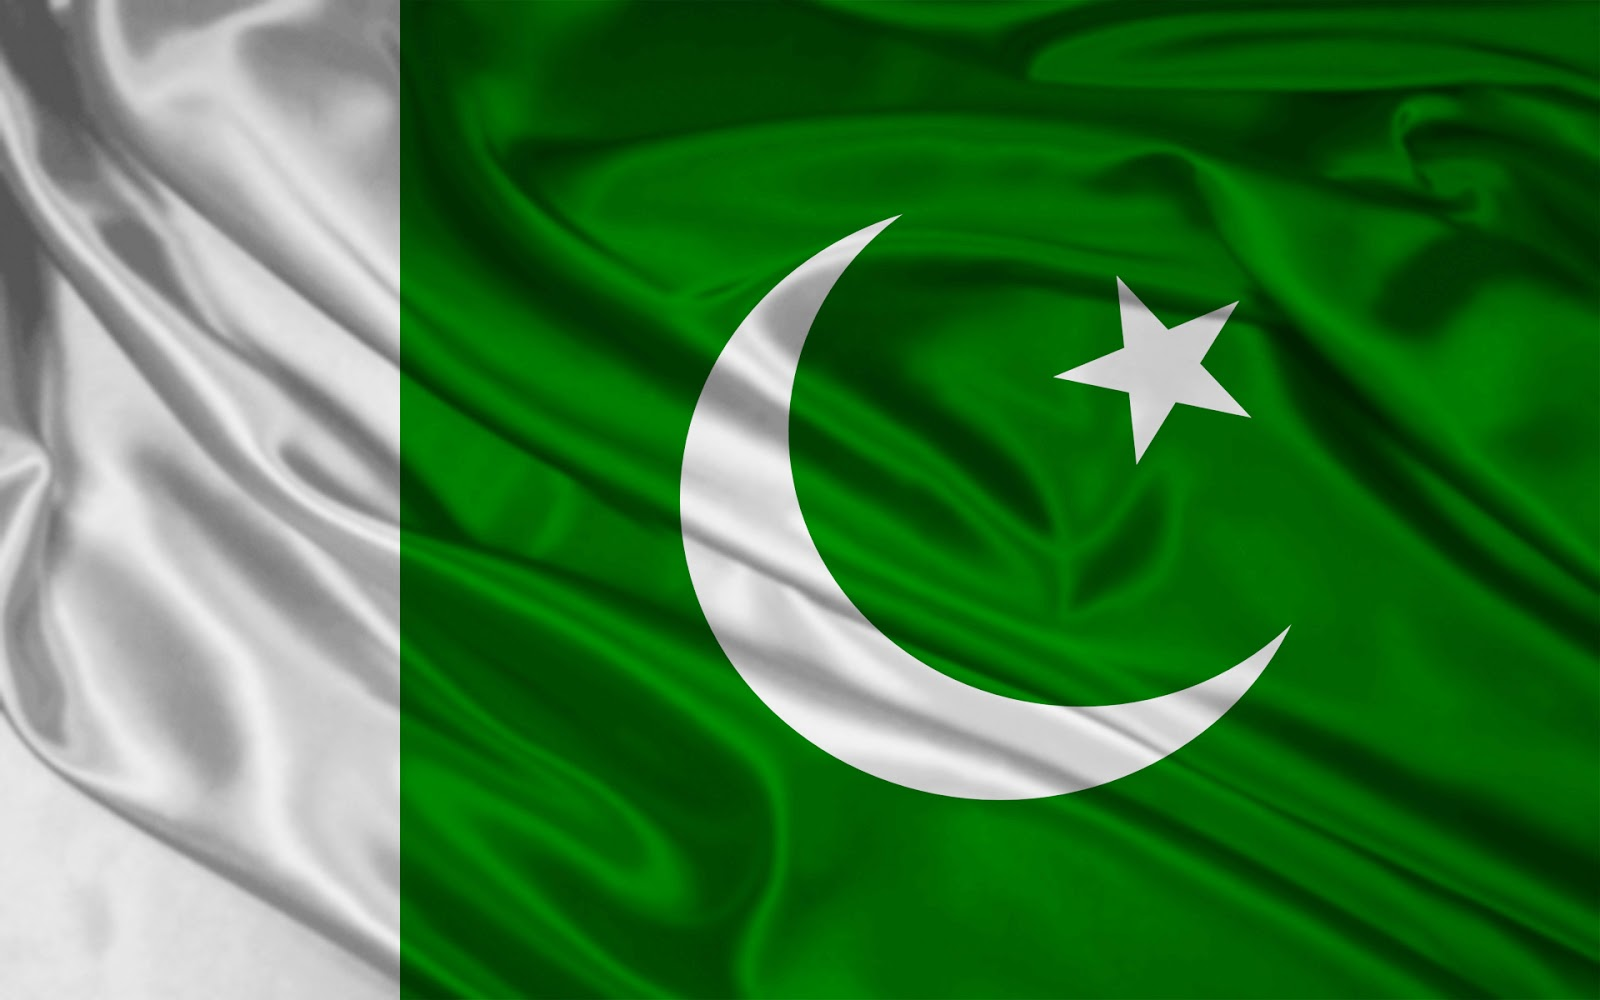 pakistan flag hd wallpapers - photo #10